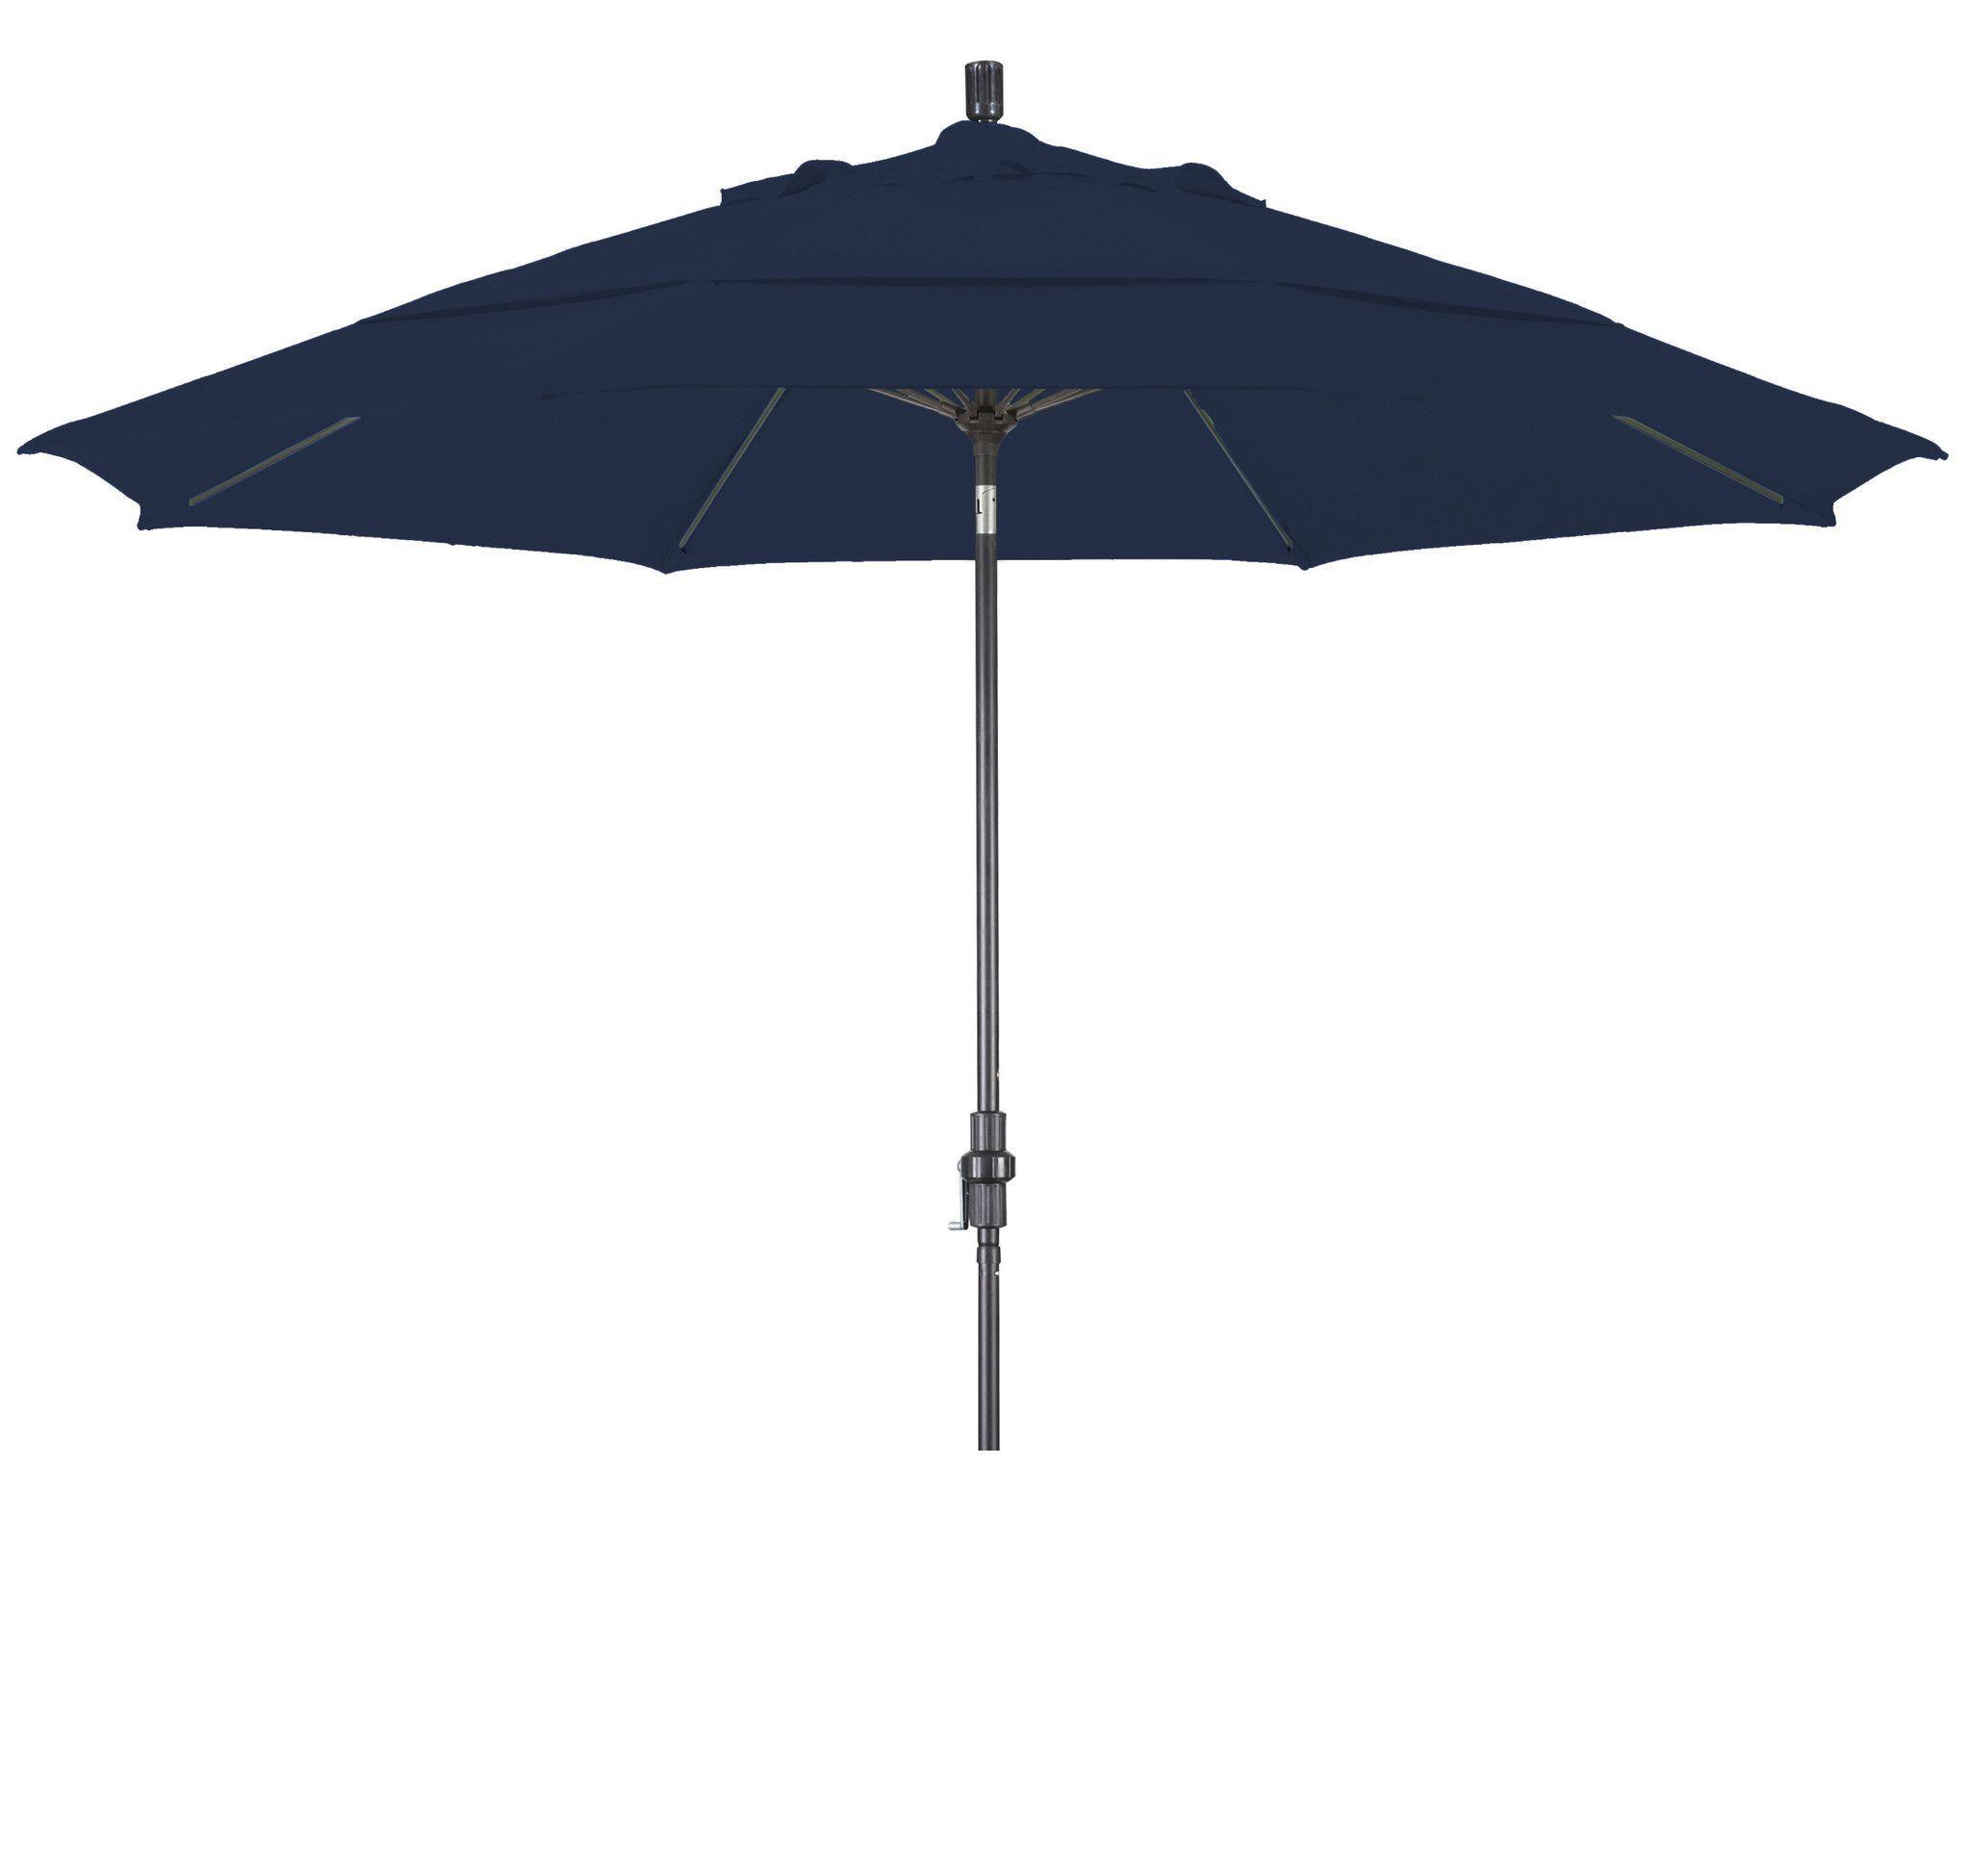 Eclipse Collection 11 Fiberglass Market Umbrella Collar Tilt DV